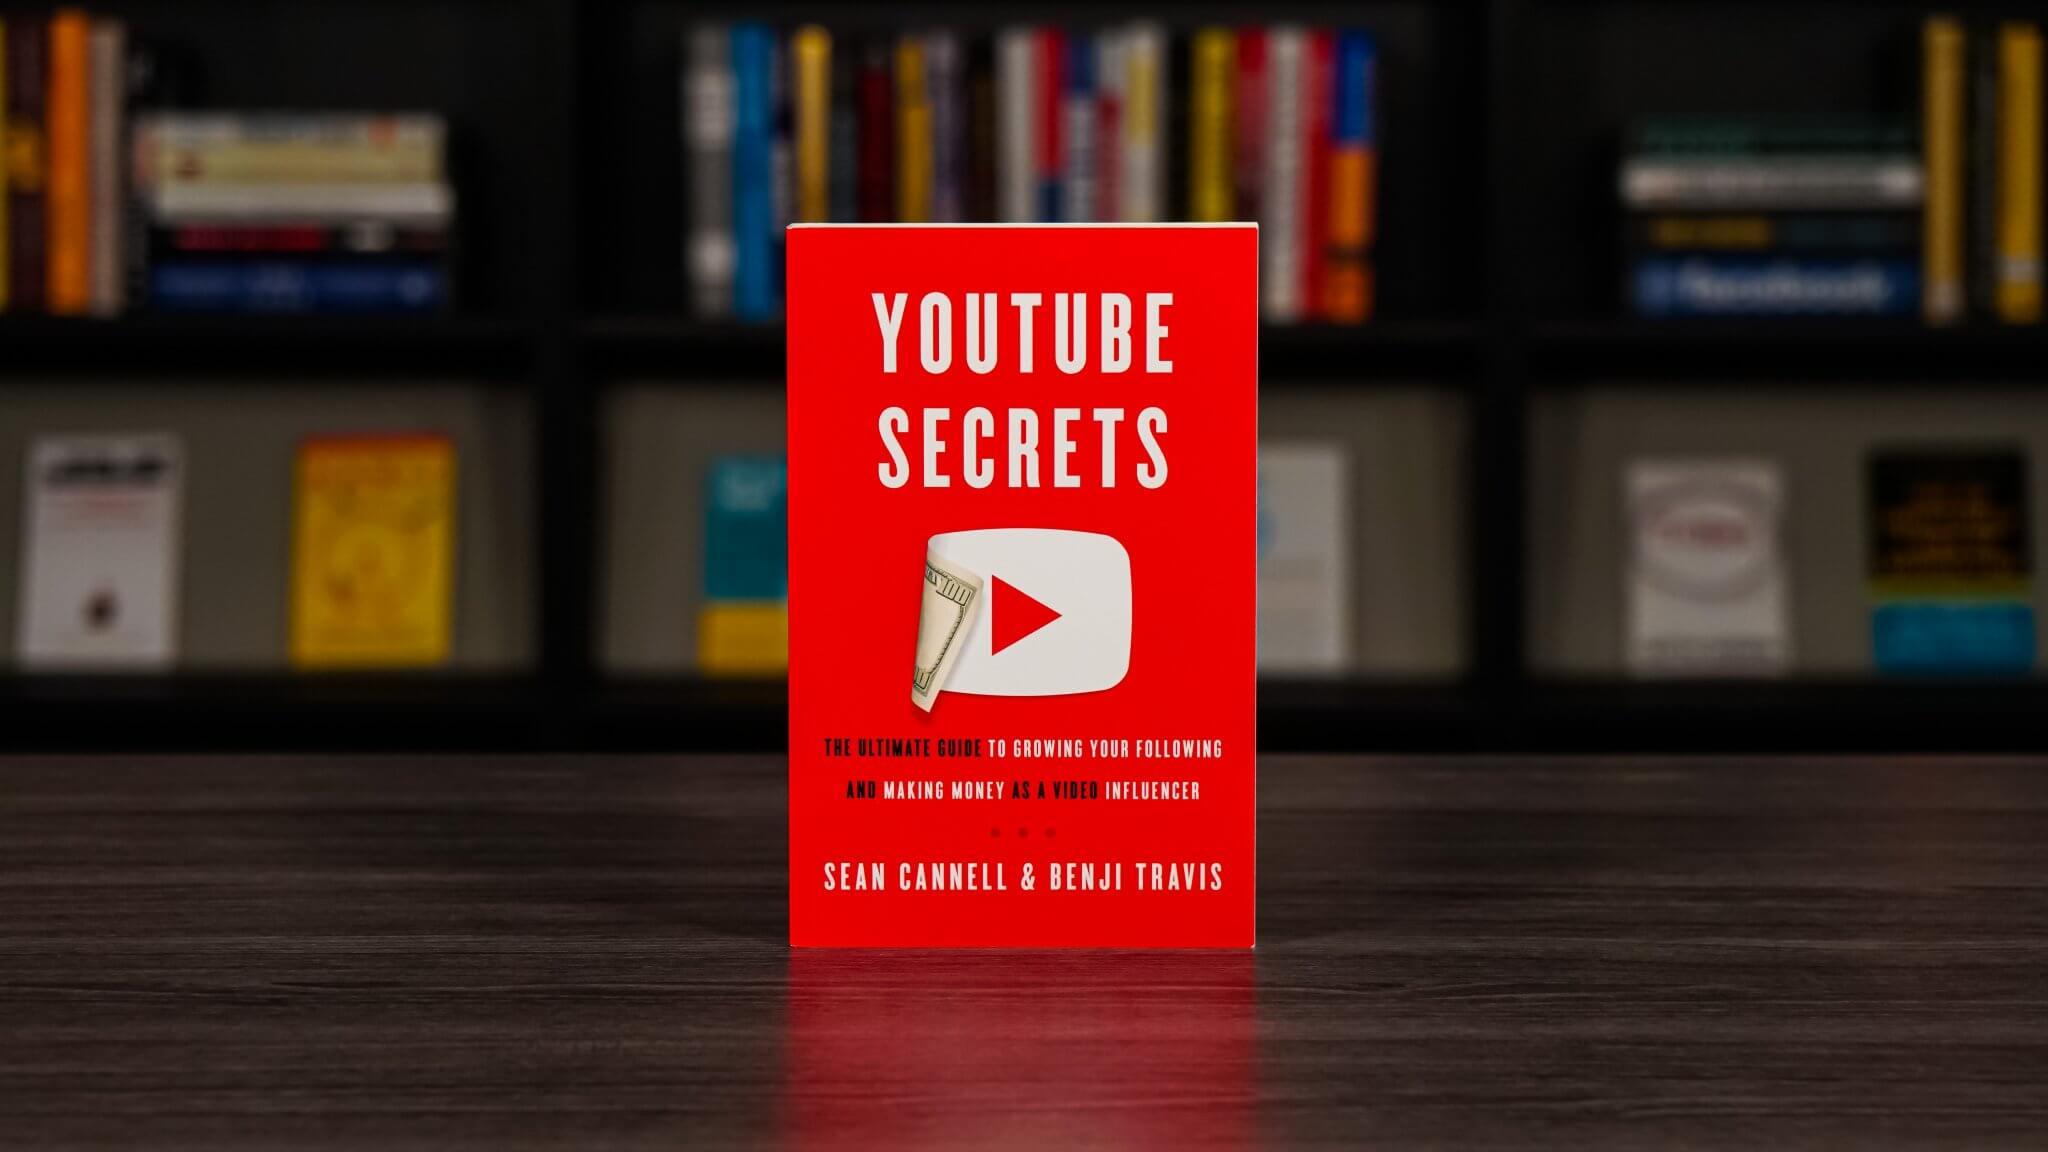 Youtube Secrets Book Cover